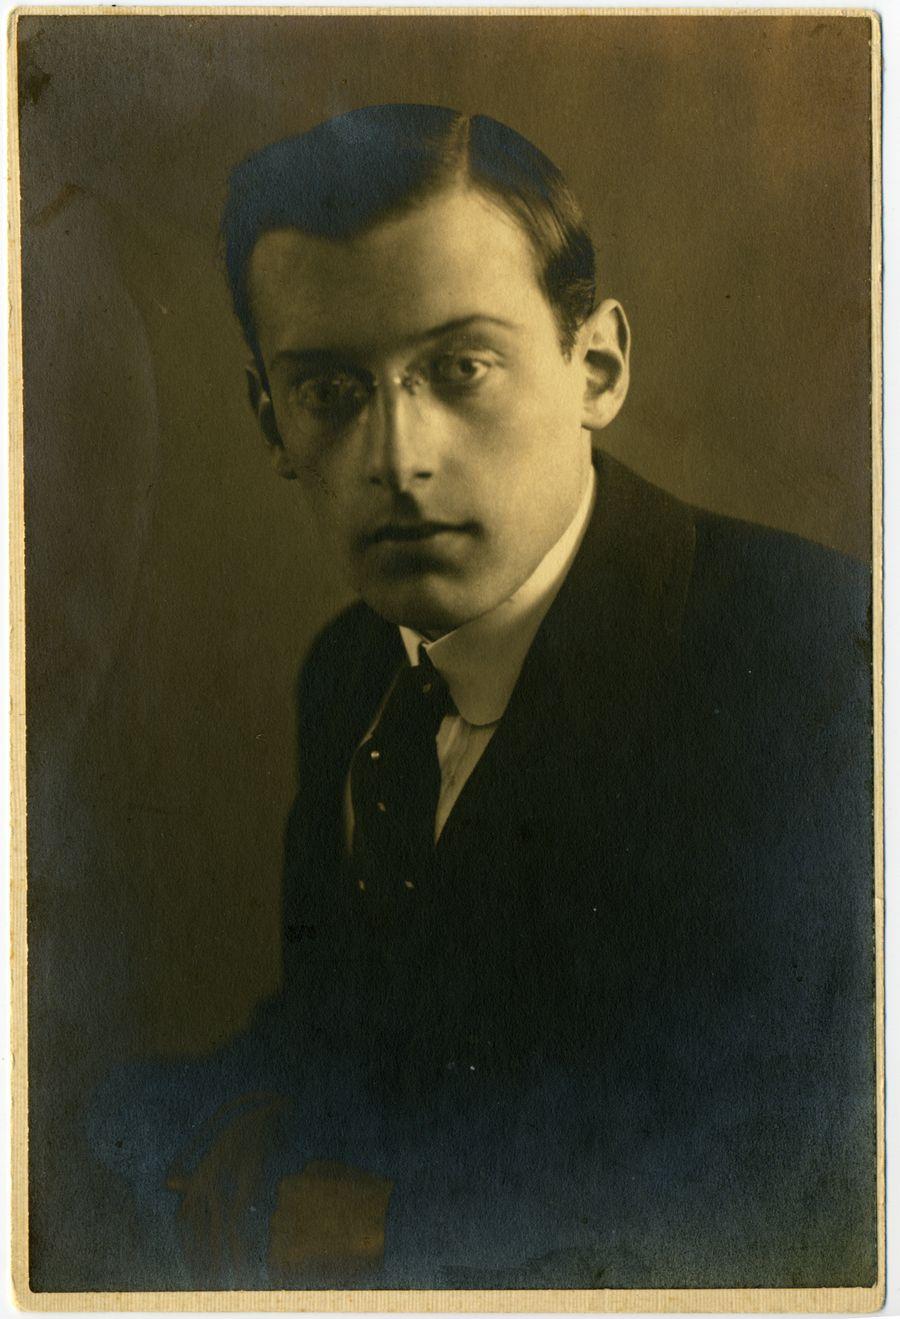 Paul Ben-Haim - Wikipedia